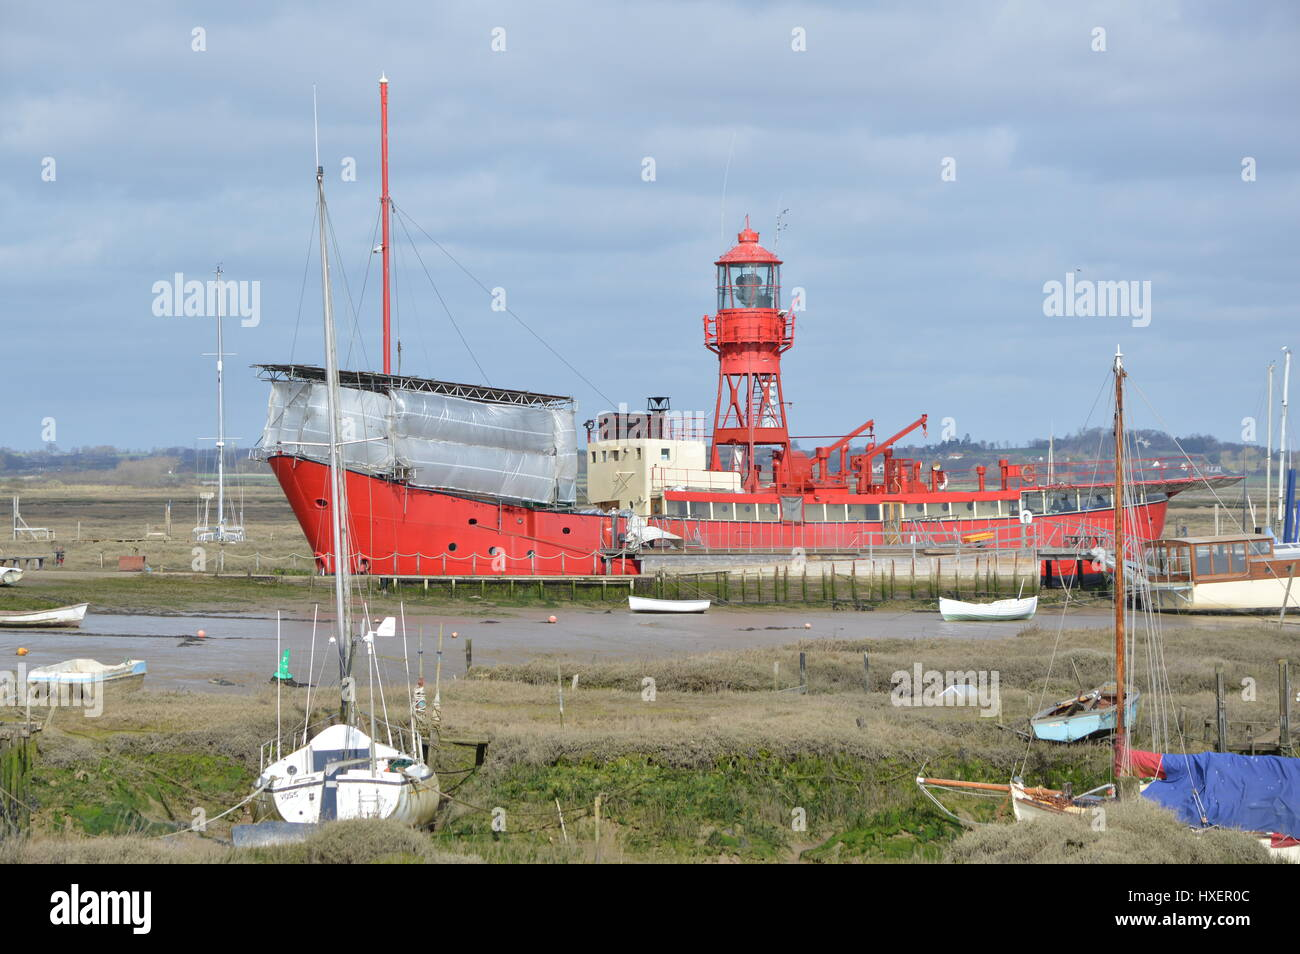 Red Boat Tollesbury Marina Stock Photo